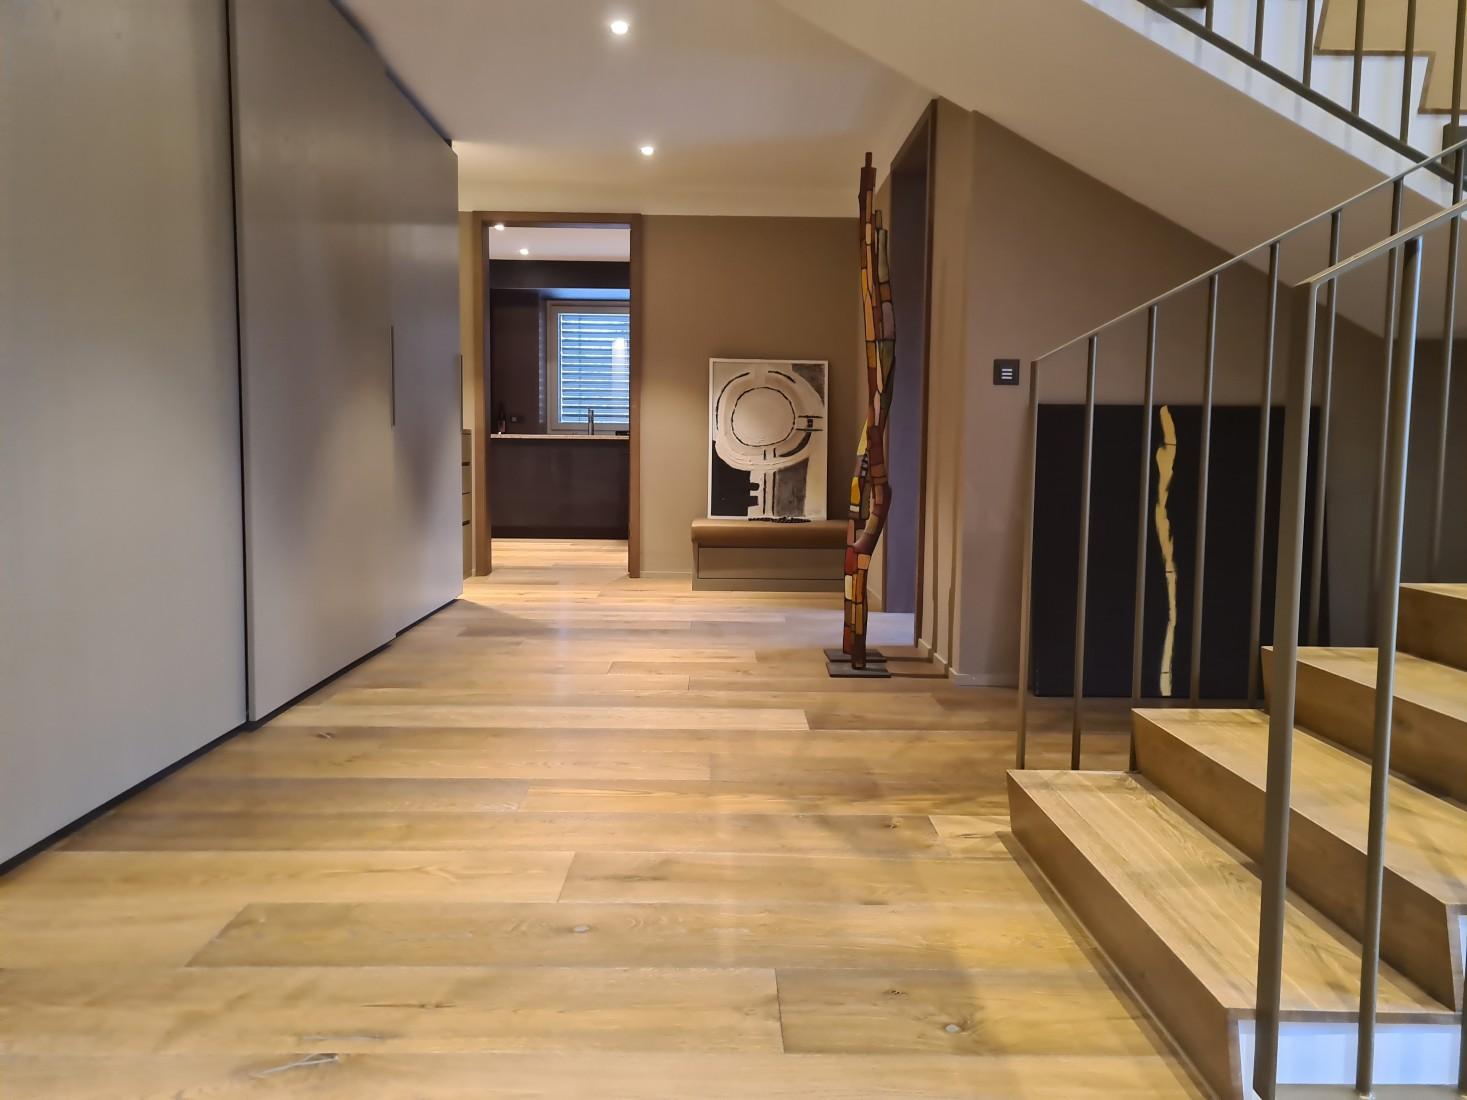 Holzboden Landhausdiele angeräuchert geölt gebürstet